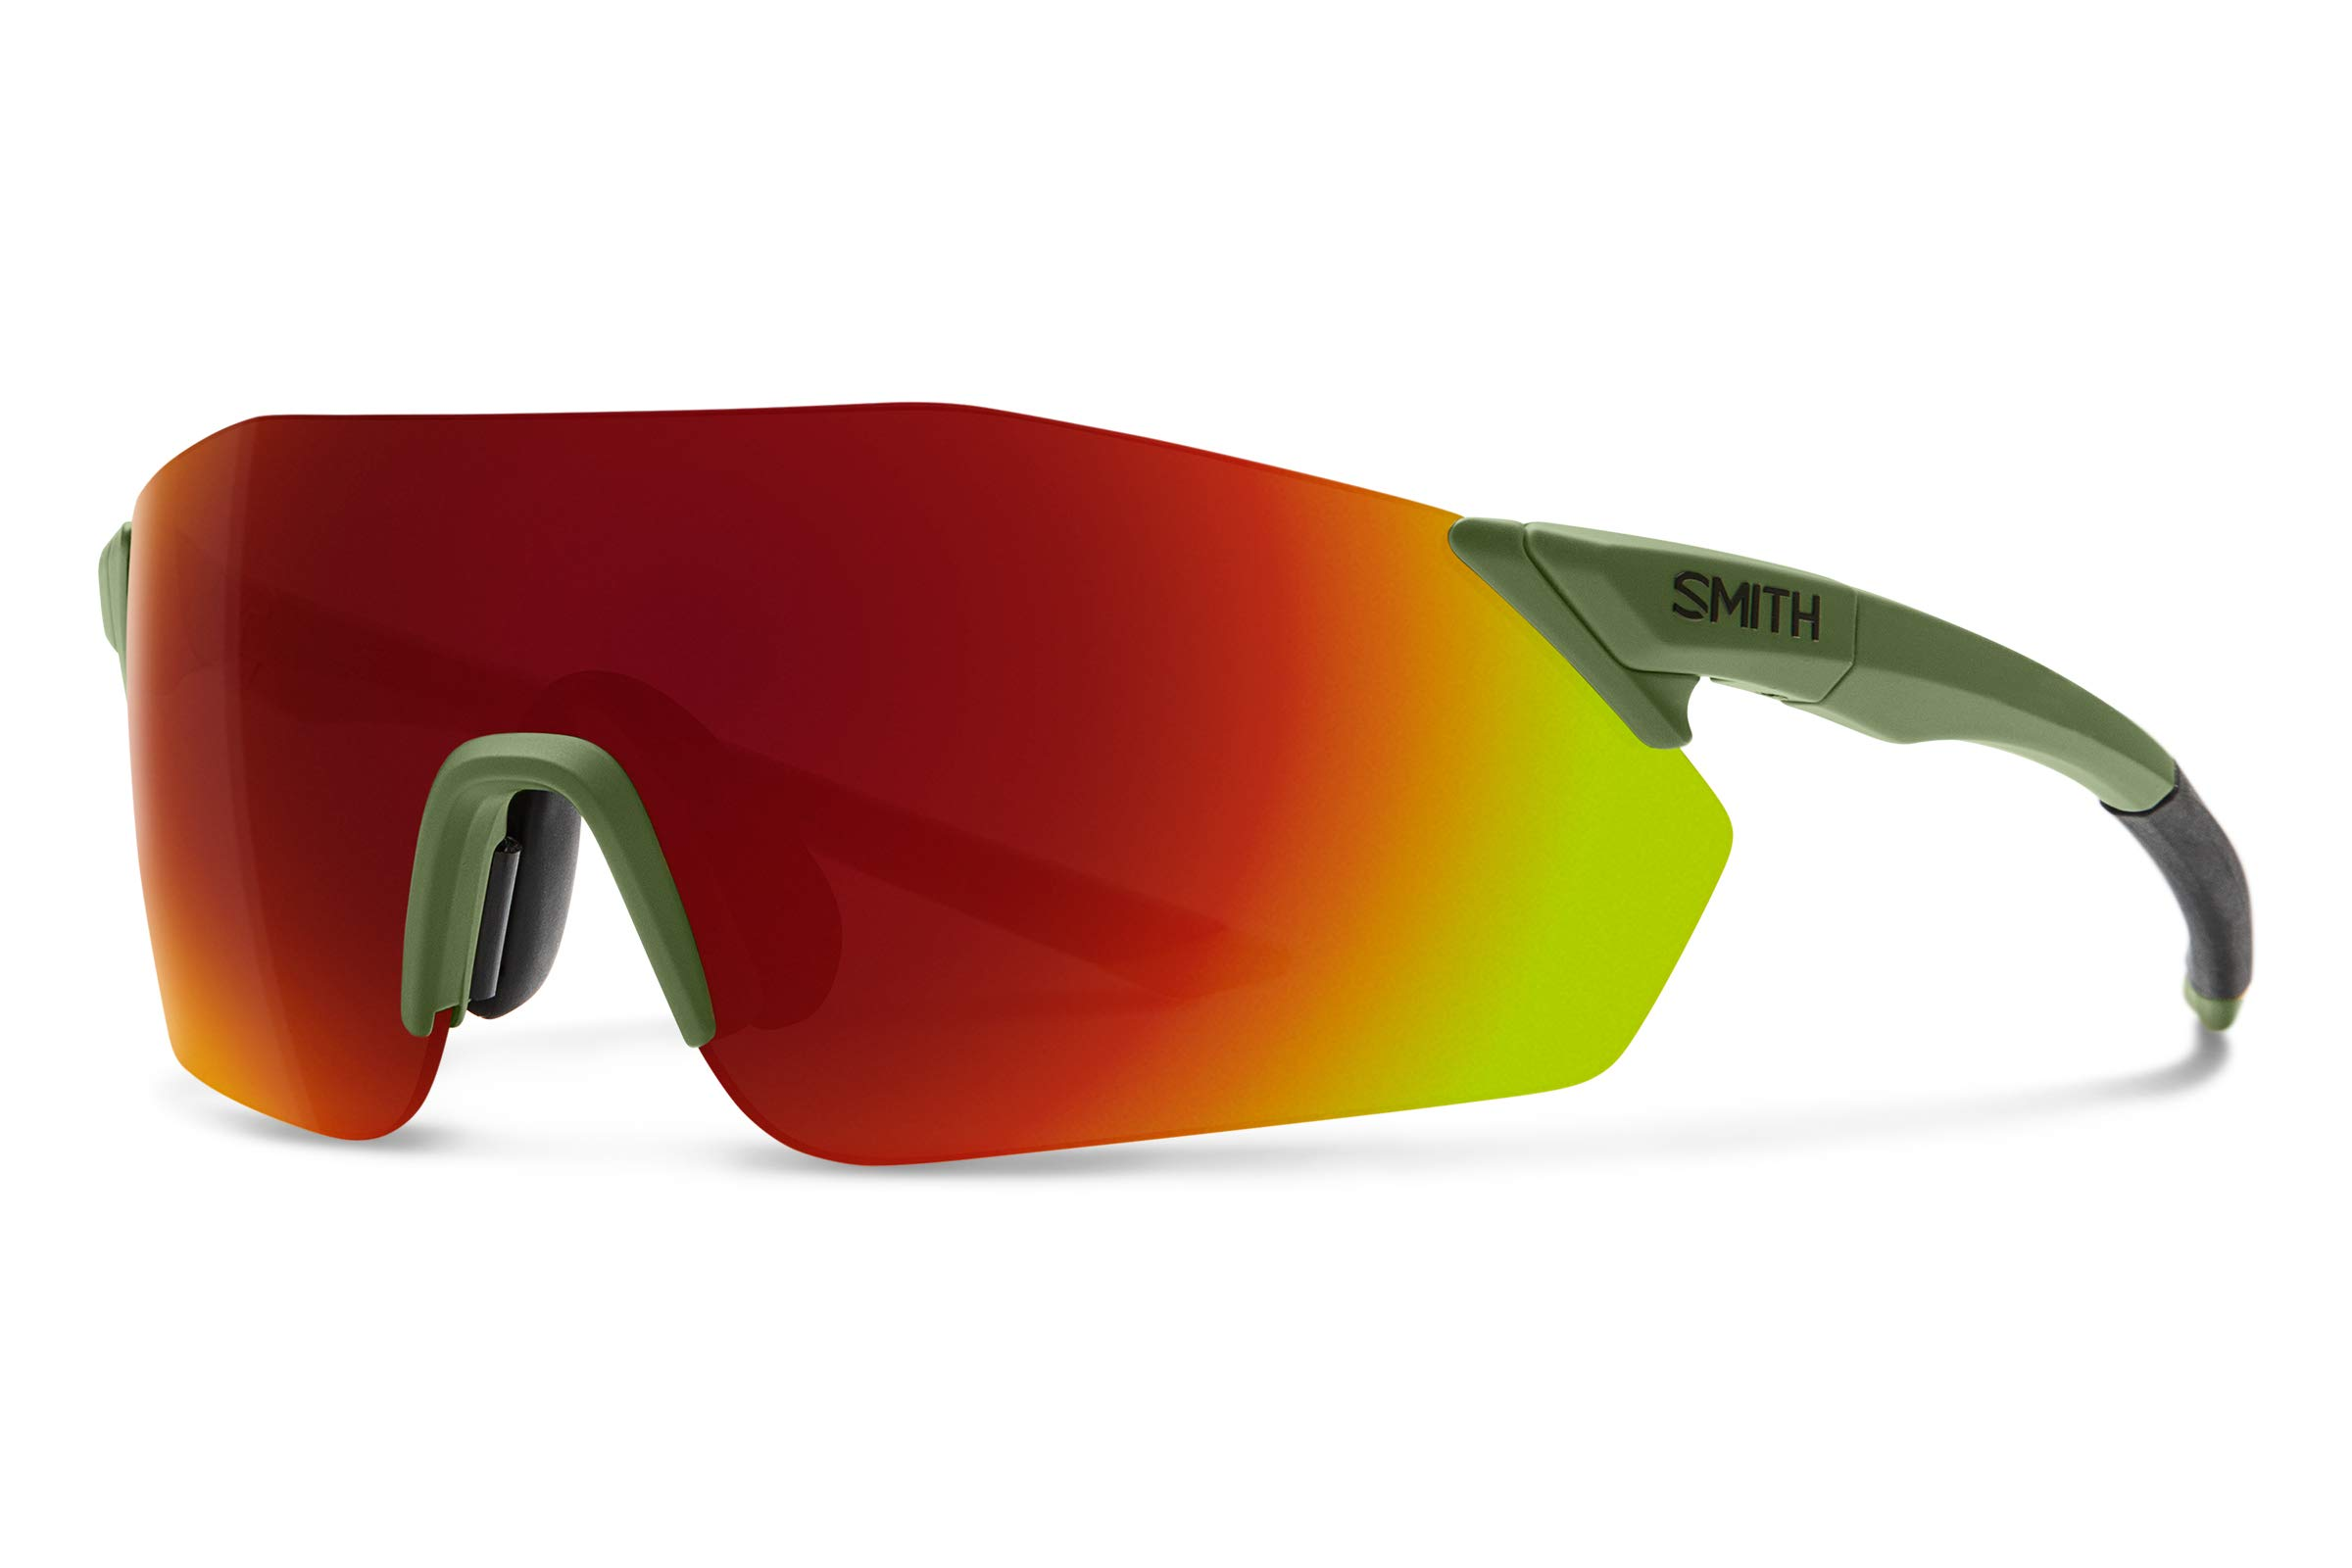 Smith Reverb Chromapop Sunglasses, Matte Moss, Chromapop Sun Red Mirror/Contrast Rose